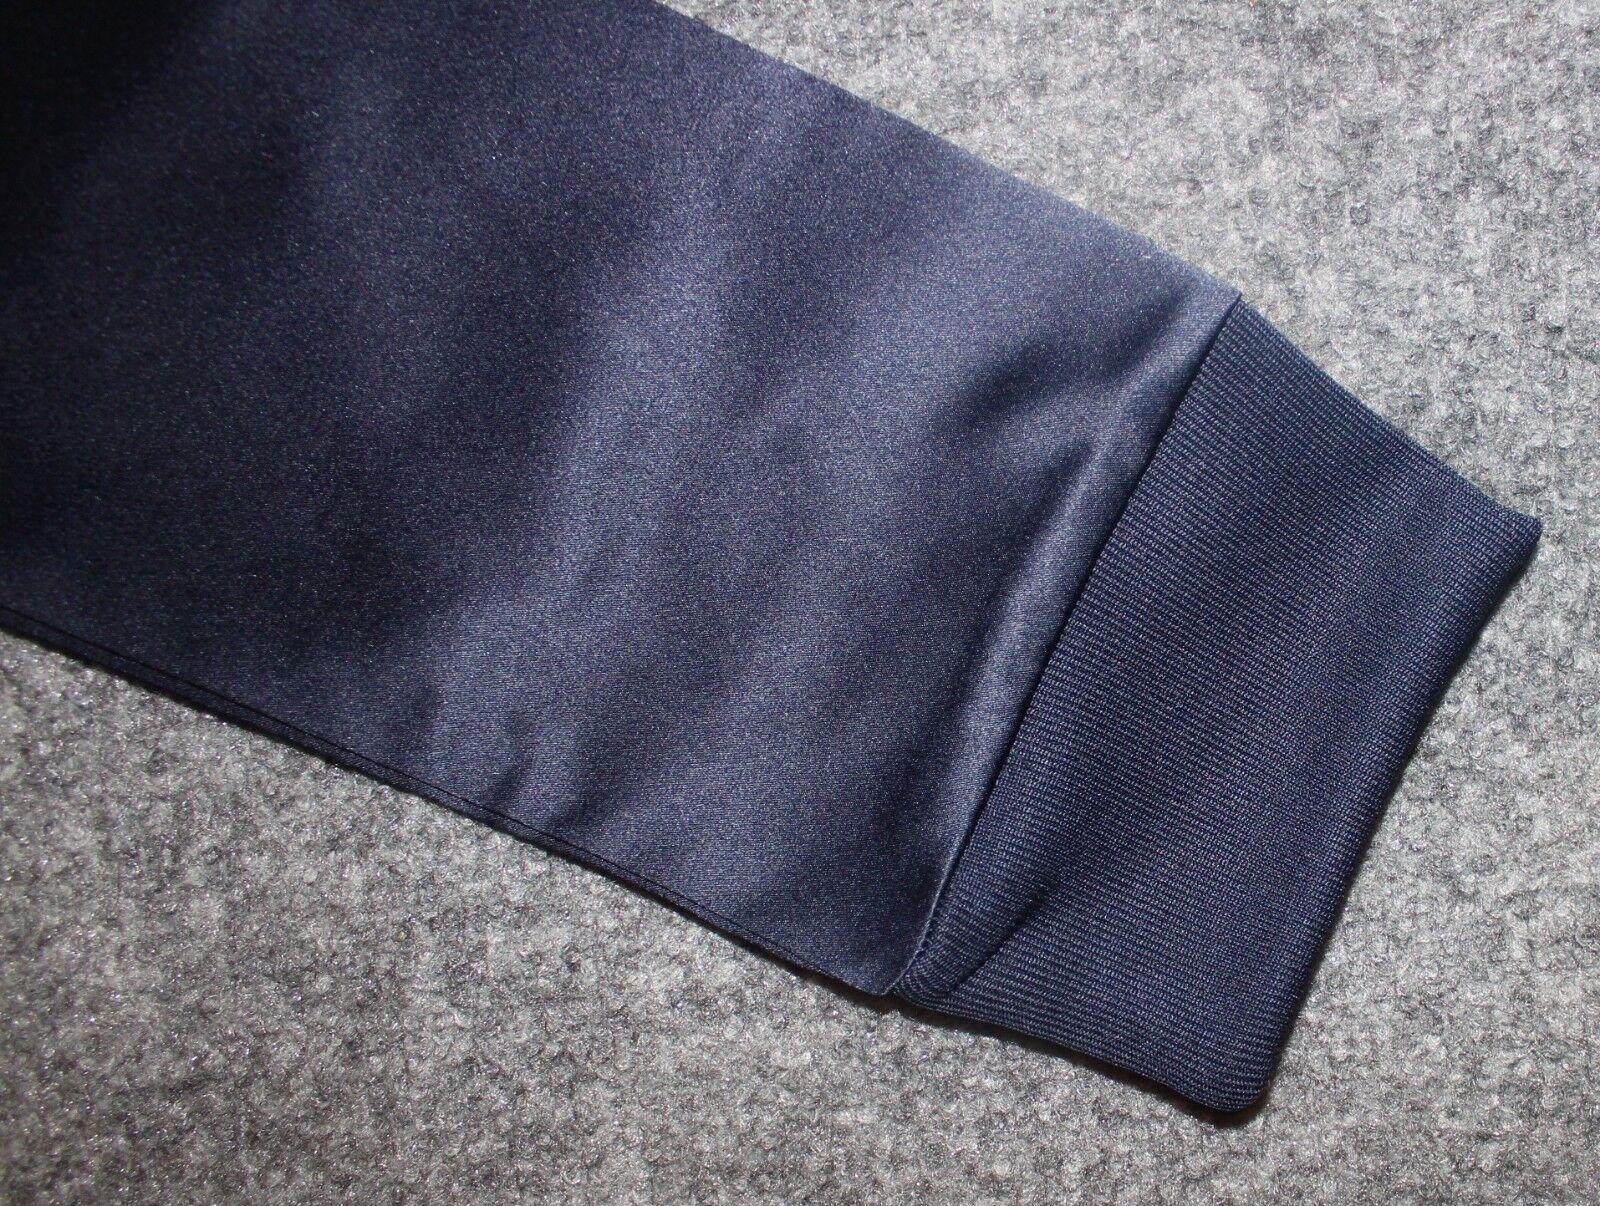 NEW ADIDAS ORIGINALS WOMEN'S SATIN TREFOIL SWEATSHIRT SIZE XL      BP9387 blueE c9243e